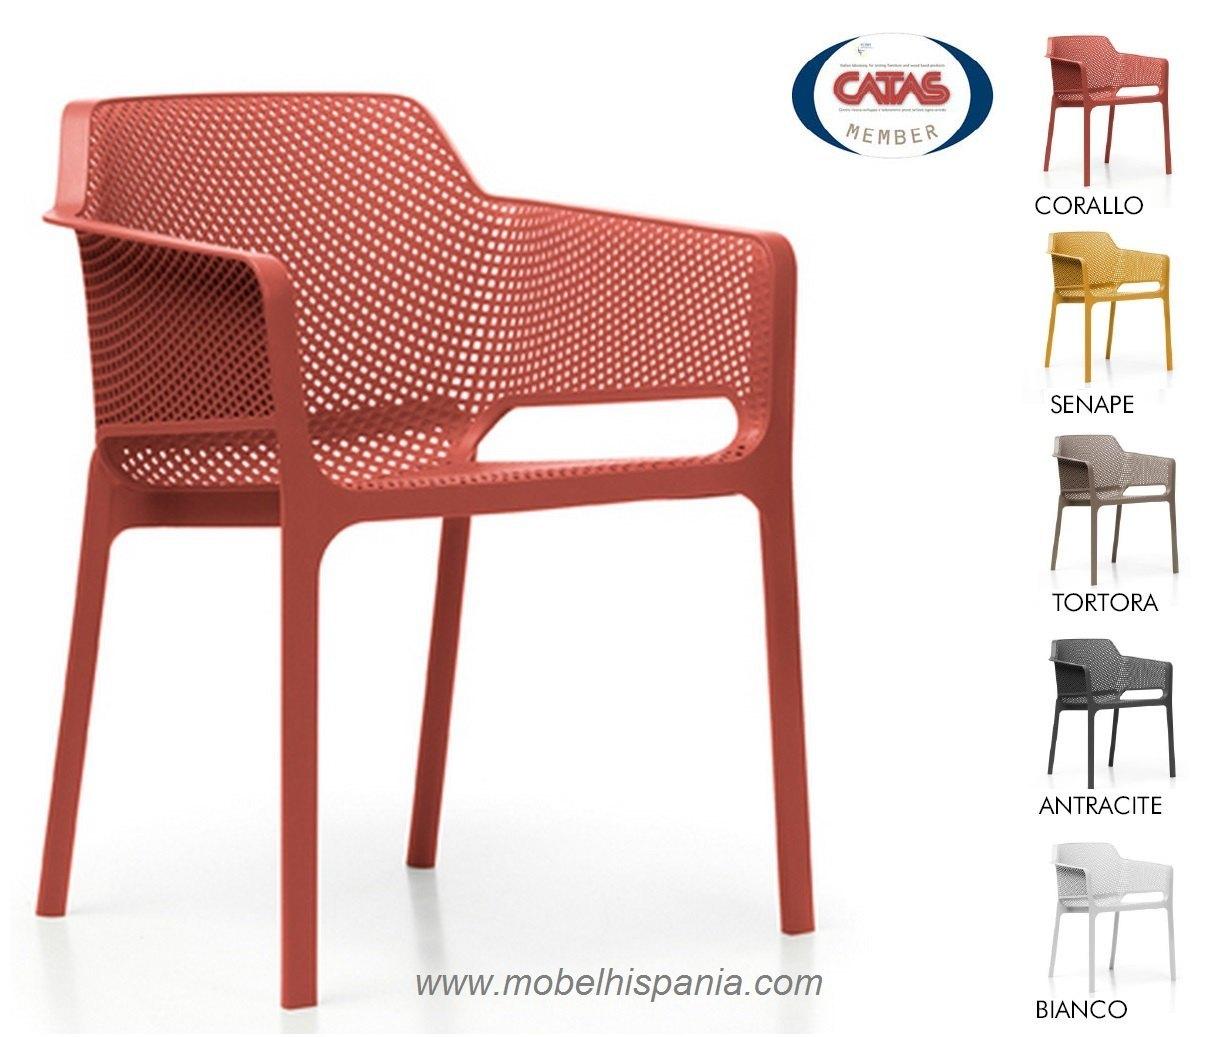 Mobel hispania mobiliario para oficinas bares for Mobiliario exterior plastico